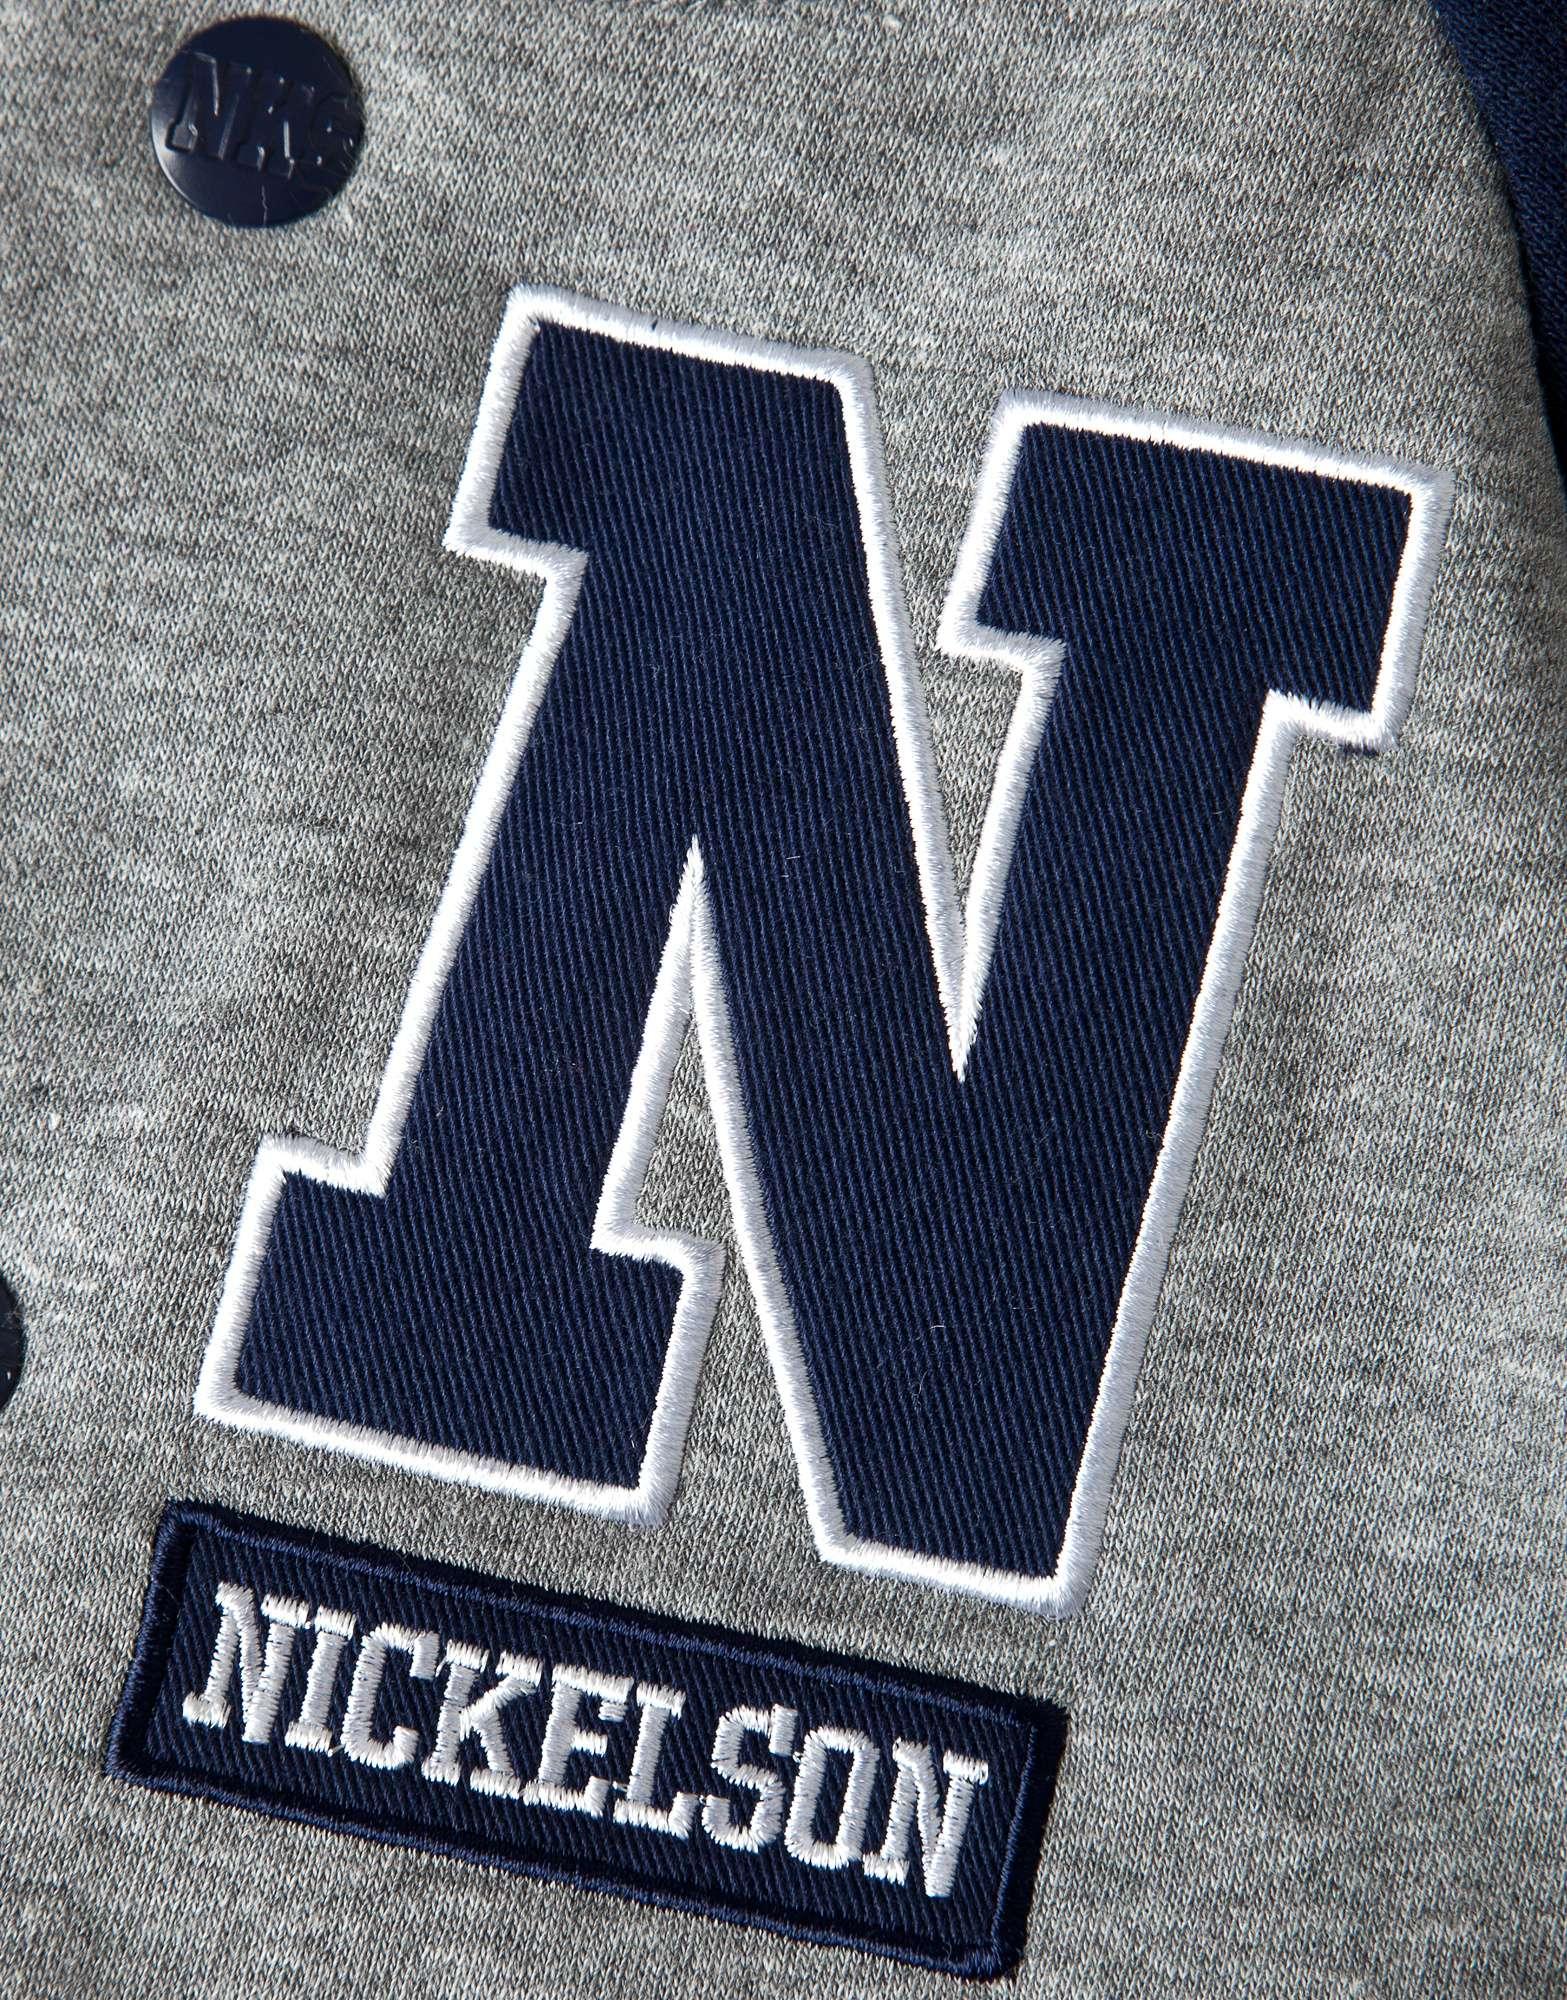 Nickelson Union Baseball Suit Infants